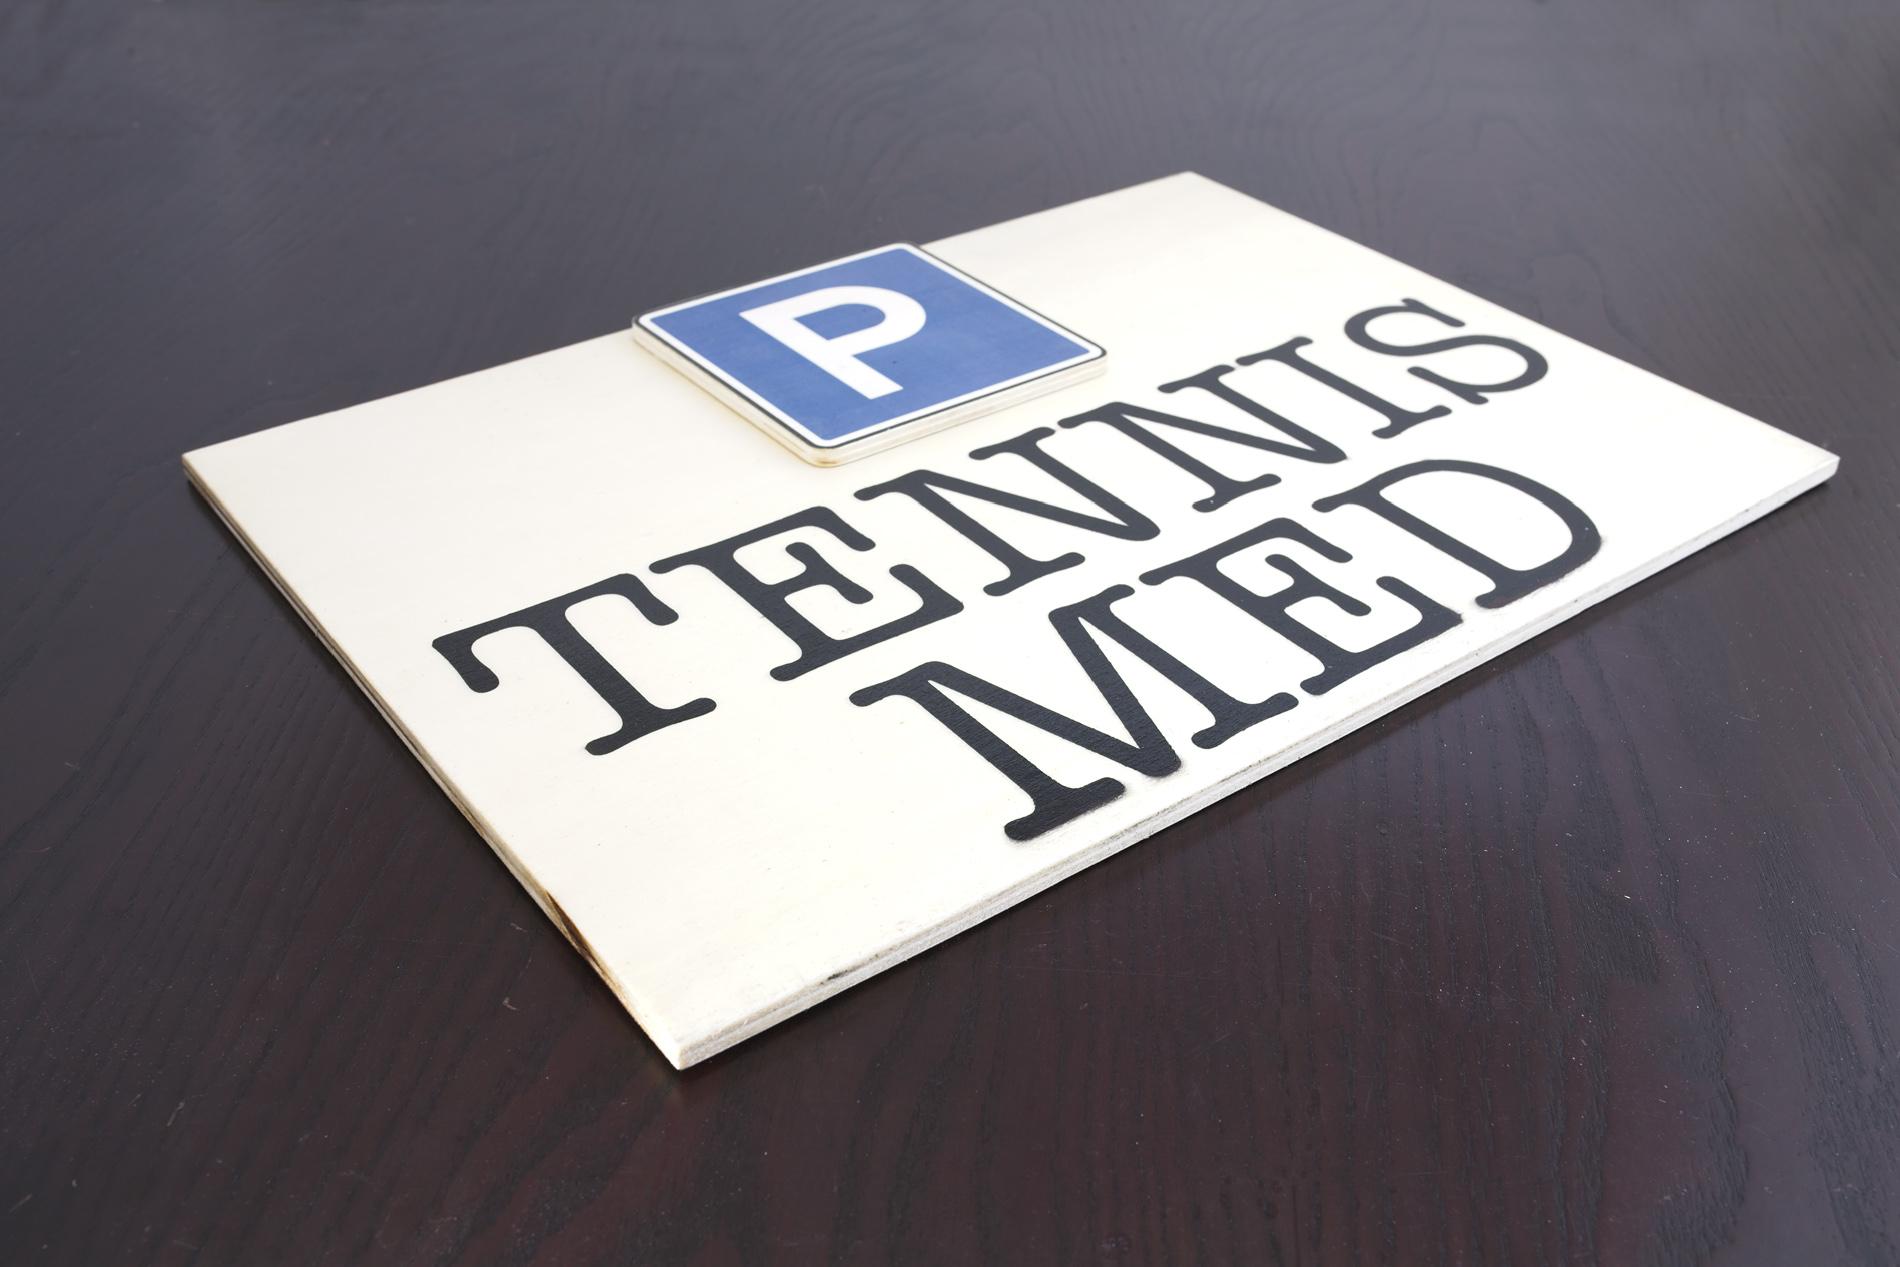 Insegne Di Legno - Tennis Med